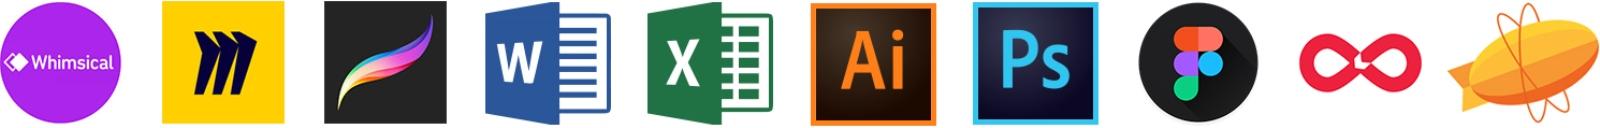 Stylit UI UX for Mobile Shopping App  Tools: Whimsical, Miro, Procreate, Microsoft Word, Microsoft Excel, Adobe Illustrator, Adobe Photoshop, Figma, Lookback, Zeplin